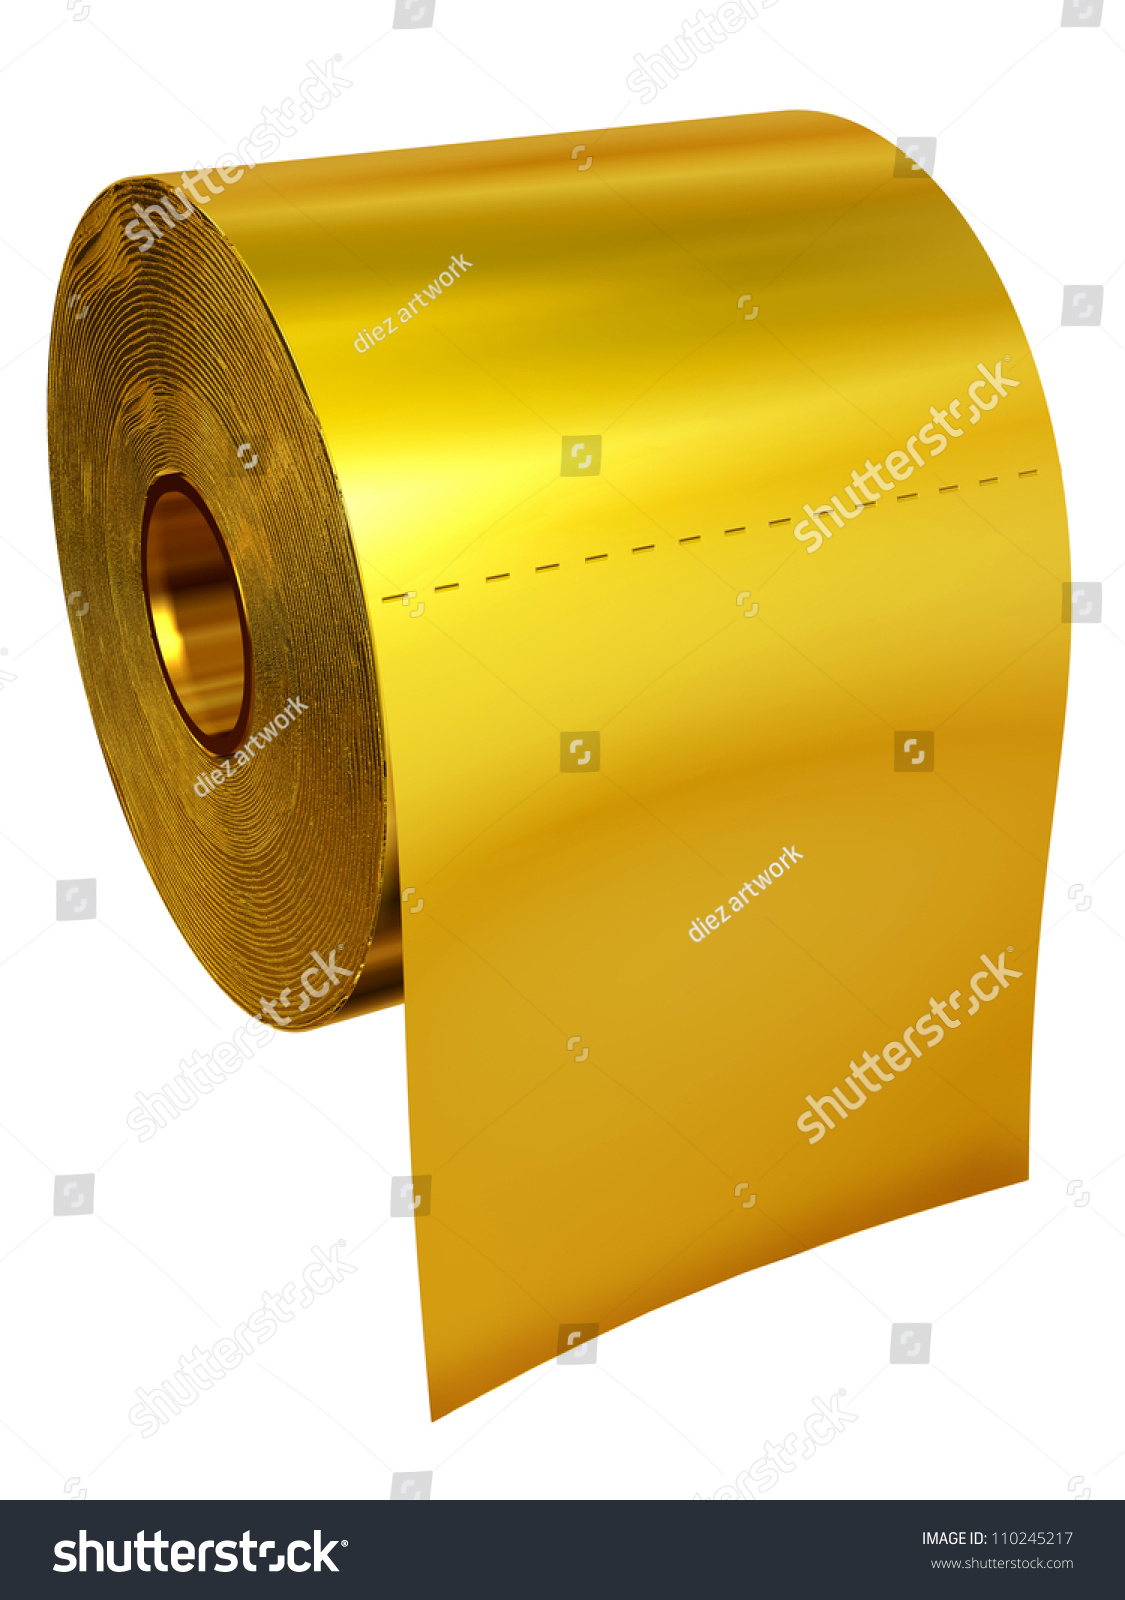 Roll of toilet tissue made of goldRoll Toilet Tissue Made Gold Stock  Illustration 110245217Toilet Made Of Gold  gold toilet hong kongNew York s Guggenheim  . Gold Flake Toilet Paper. Home Design Ideas